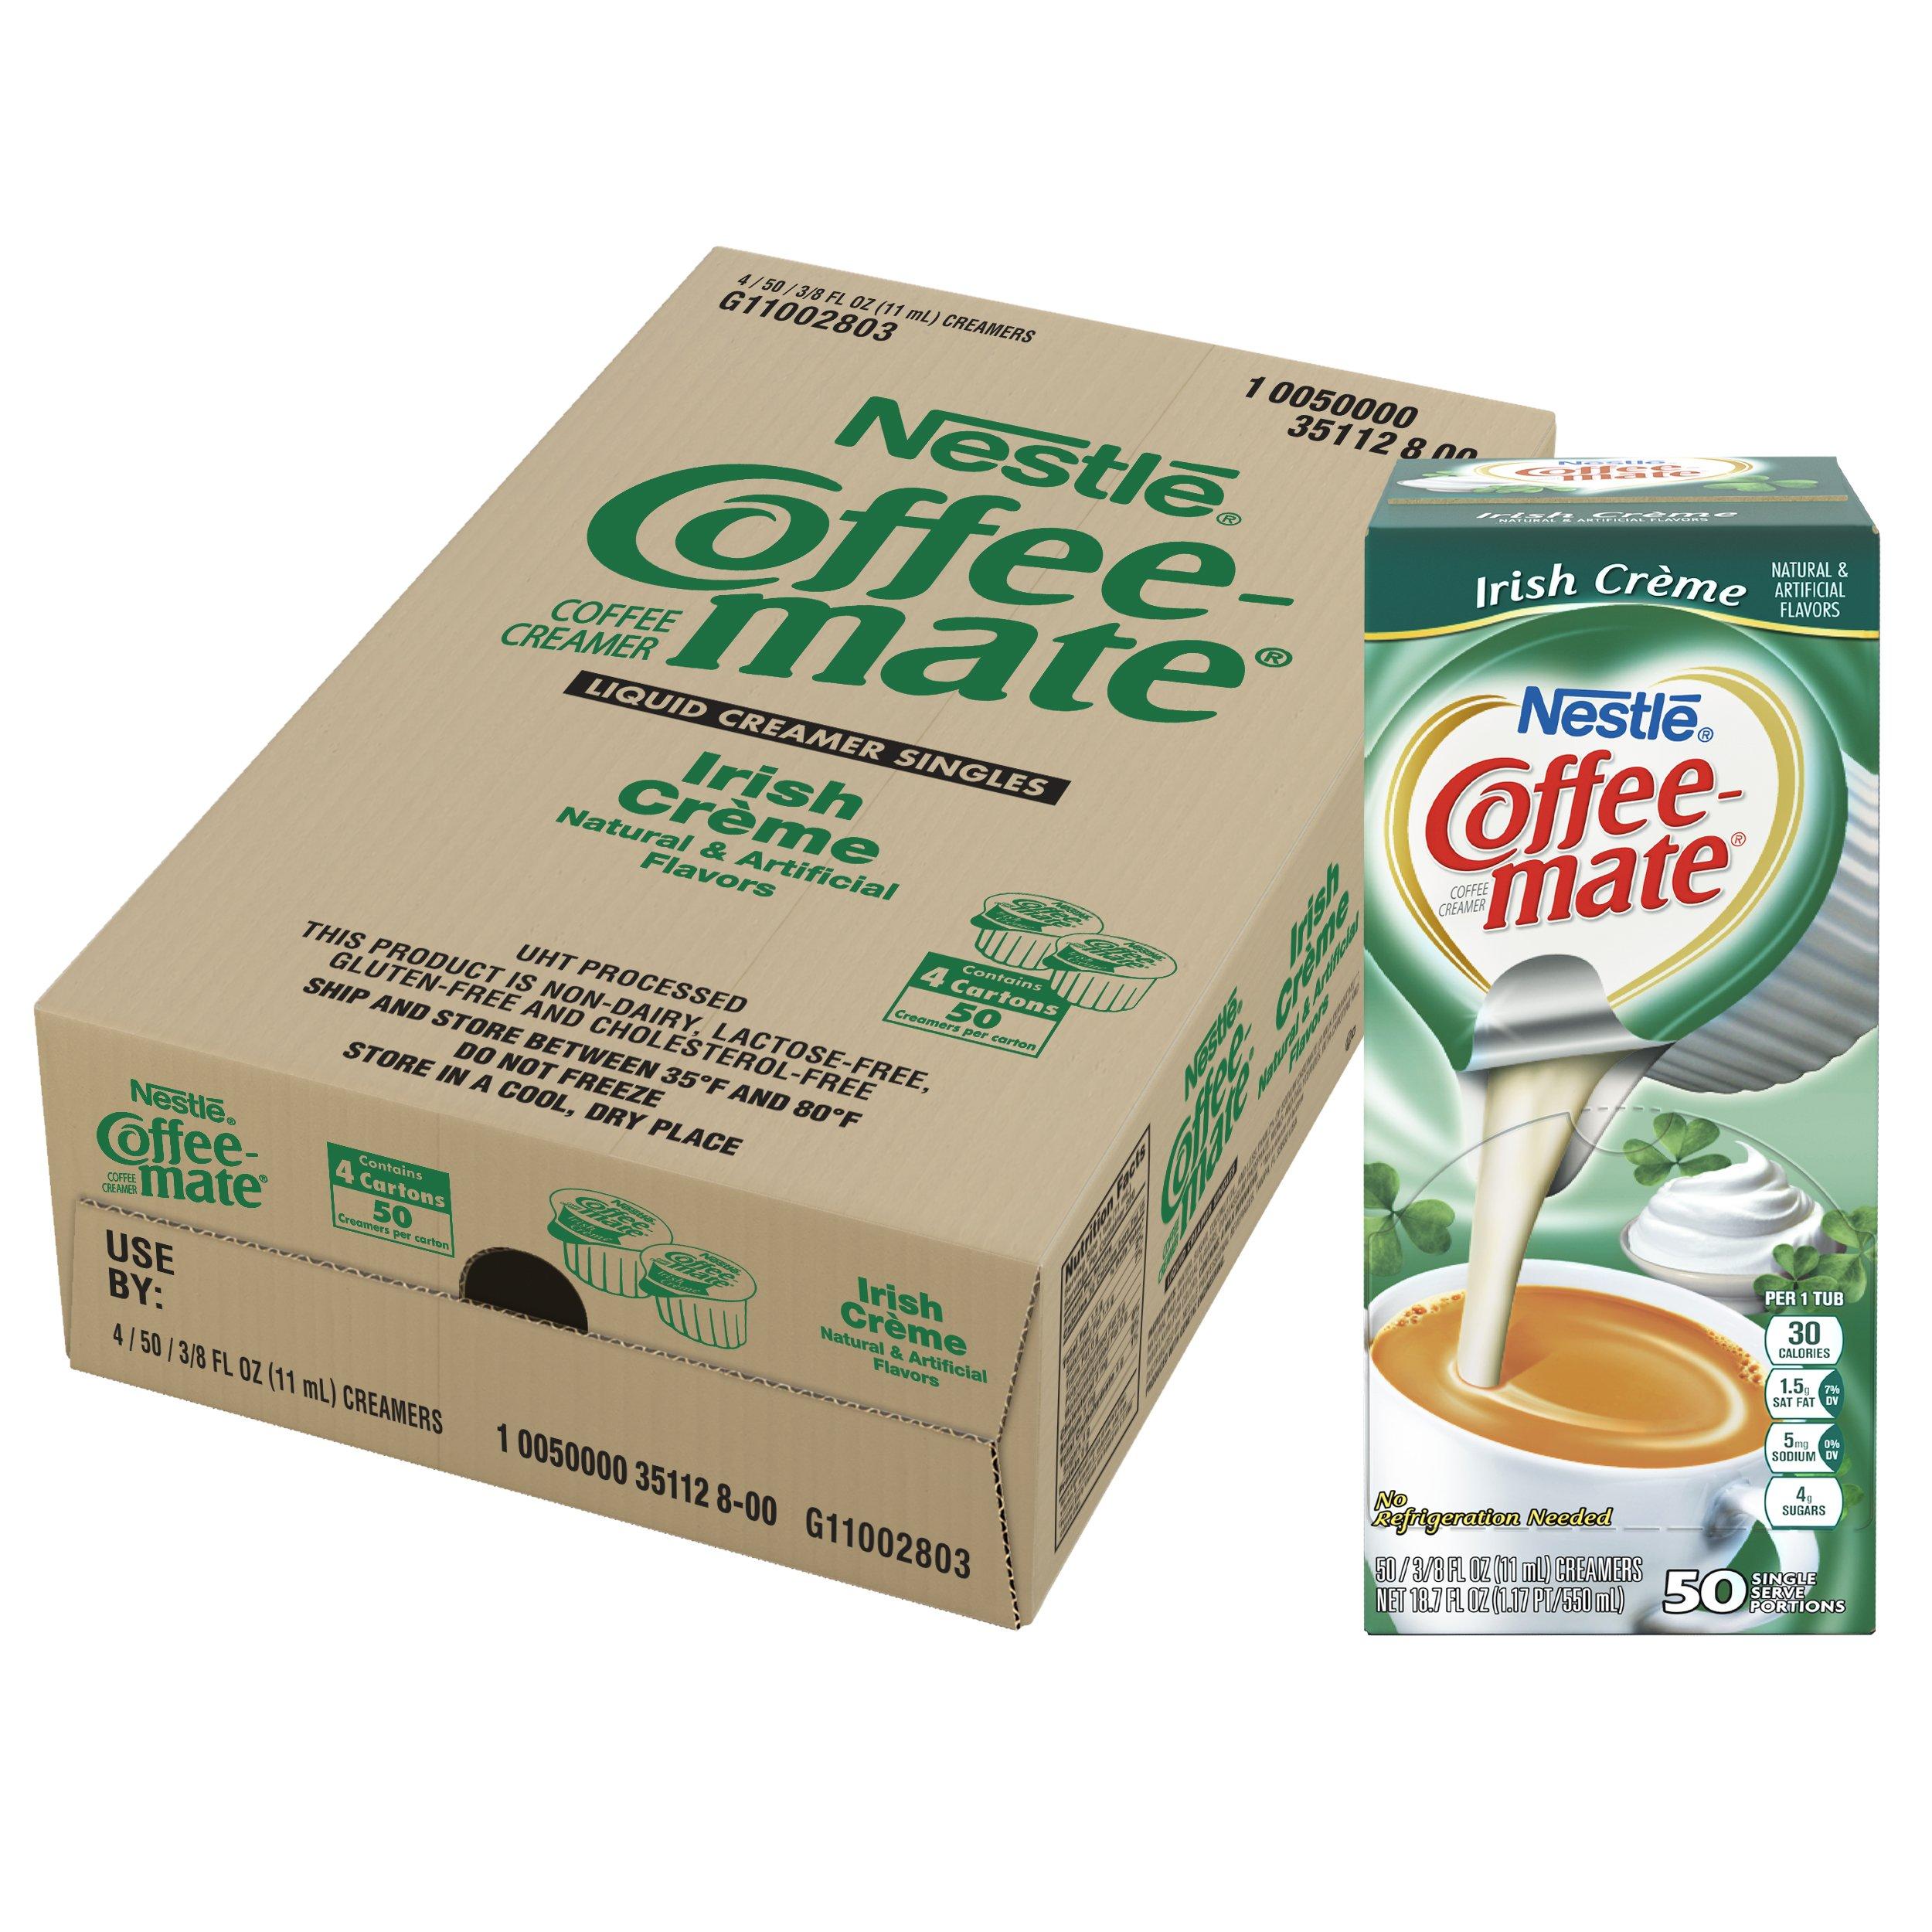 NESTLE COFFEE-MATE Coffee Creamer, Irish Creme, liquid creamer singles, 50 Count (Pack of 4) by Nestle Coffee Mate (Image #6)